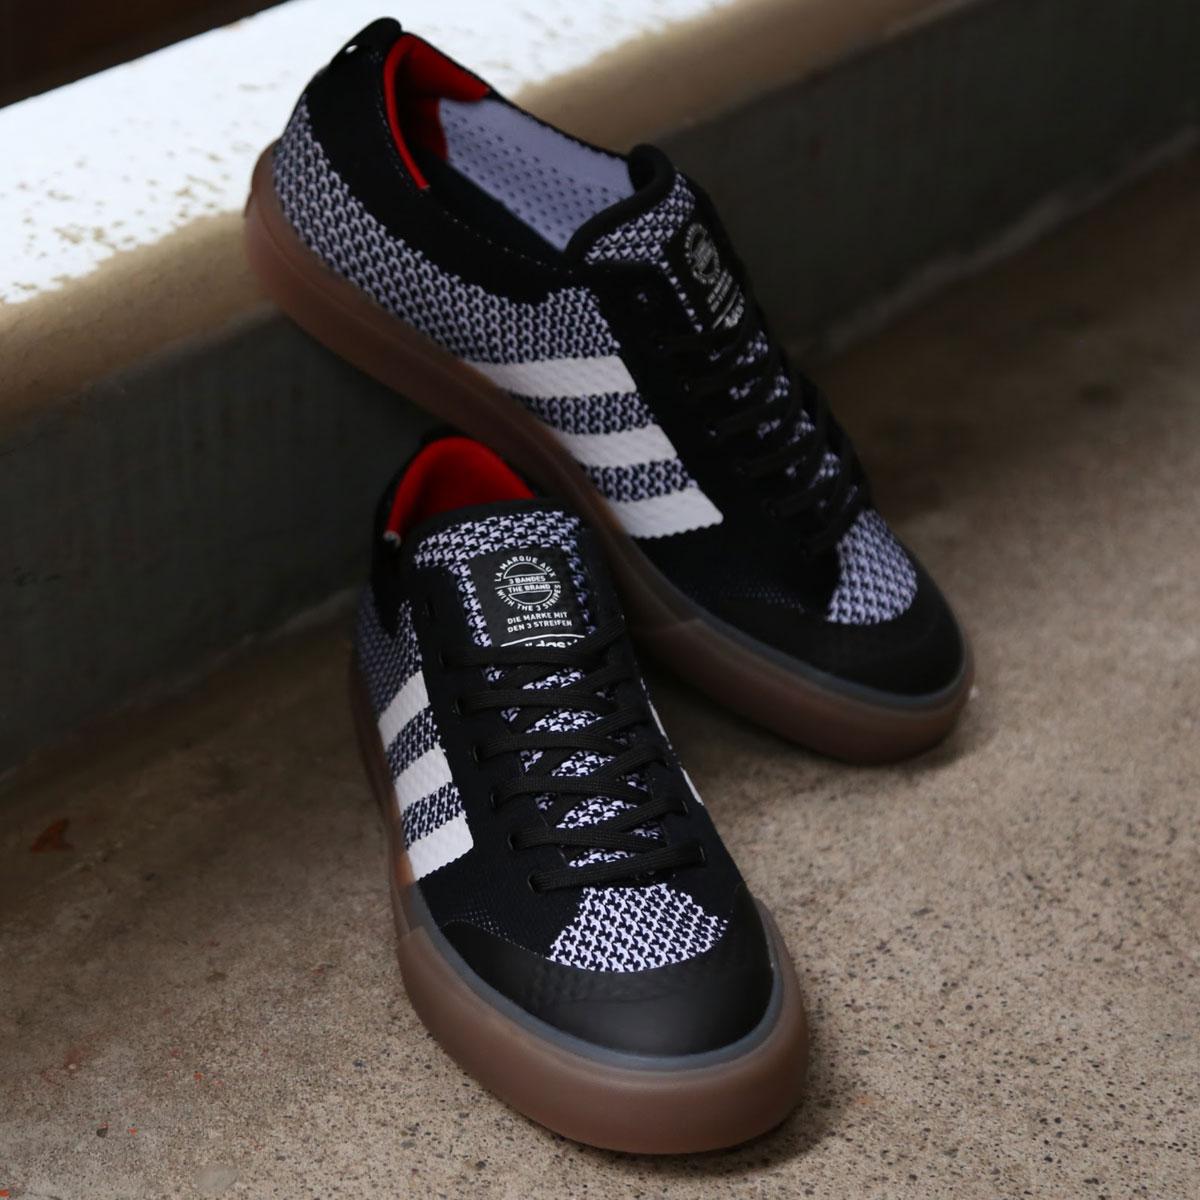 adidas Originals  MATCHCOURT PK (アディダス オリジナルス マッチコート PK) CORE BLACK/RUNNING WHITE/GUM4【メンズ スニーカー】17FW-I